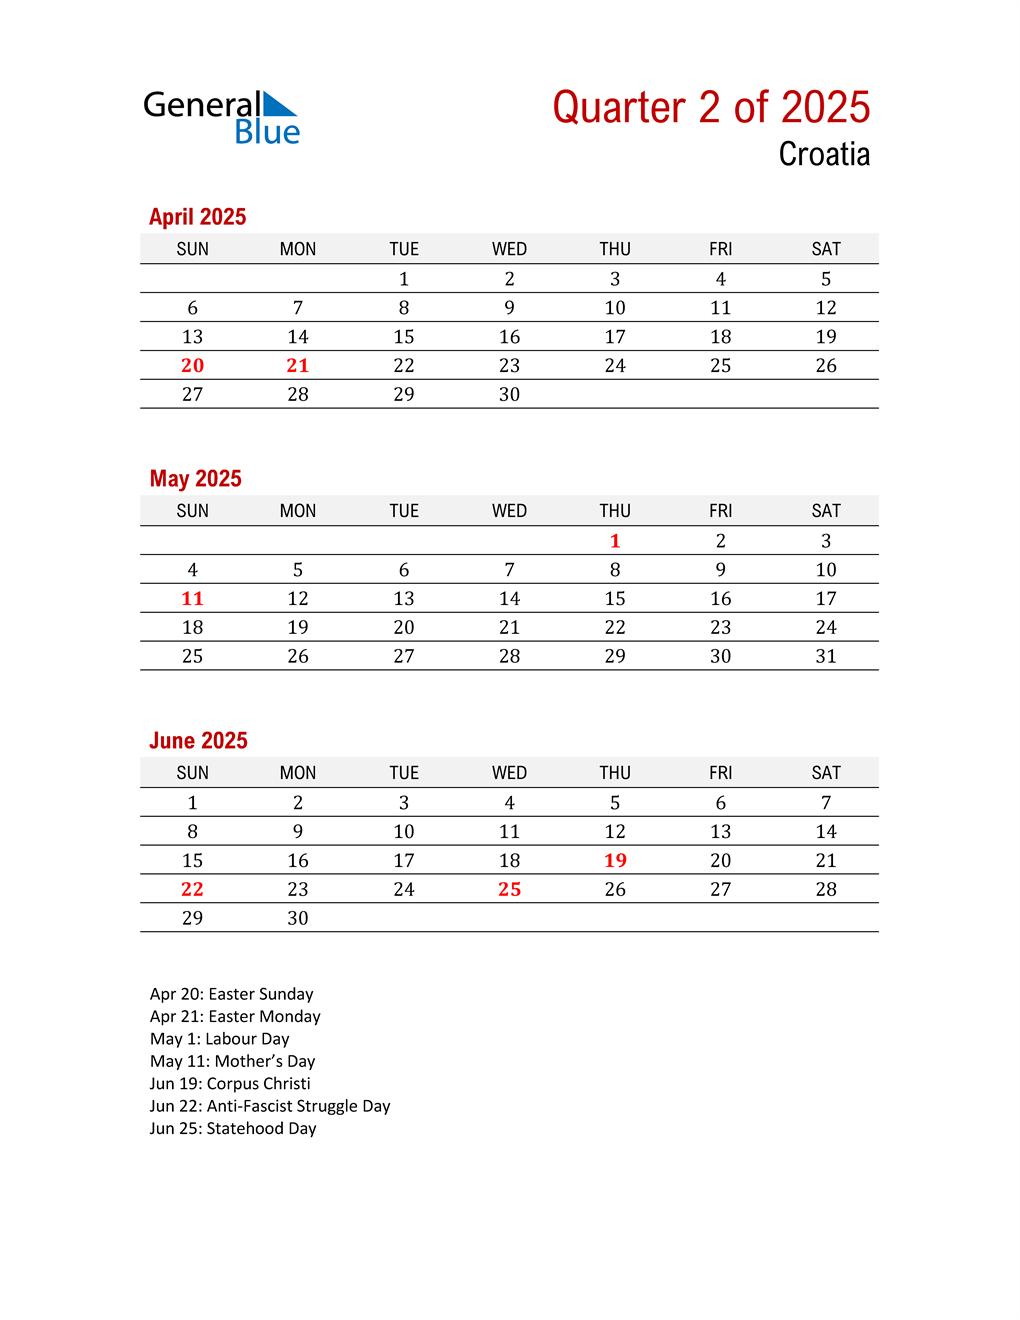 Printable Three Month Calendar for Croatia